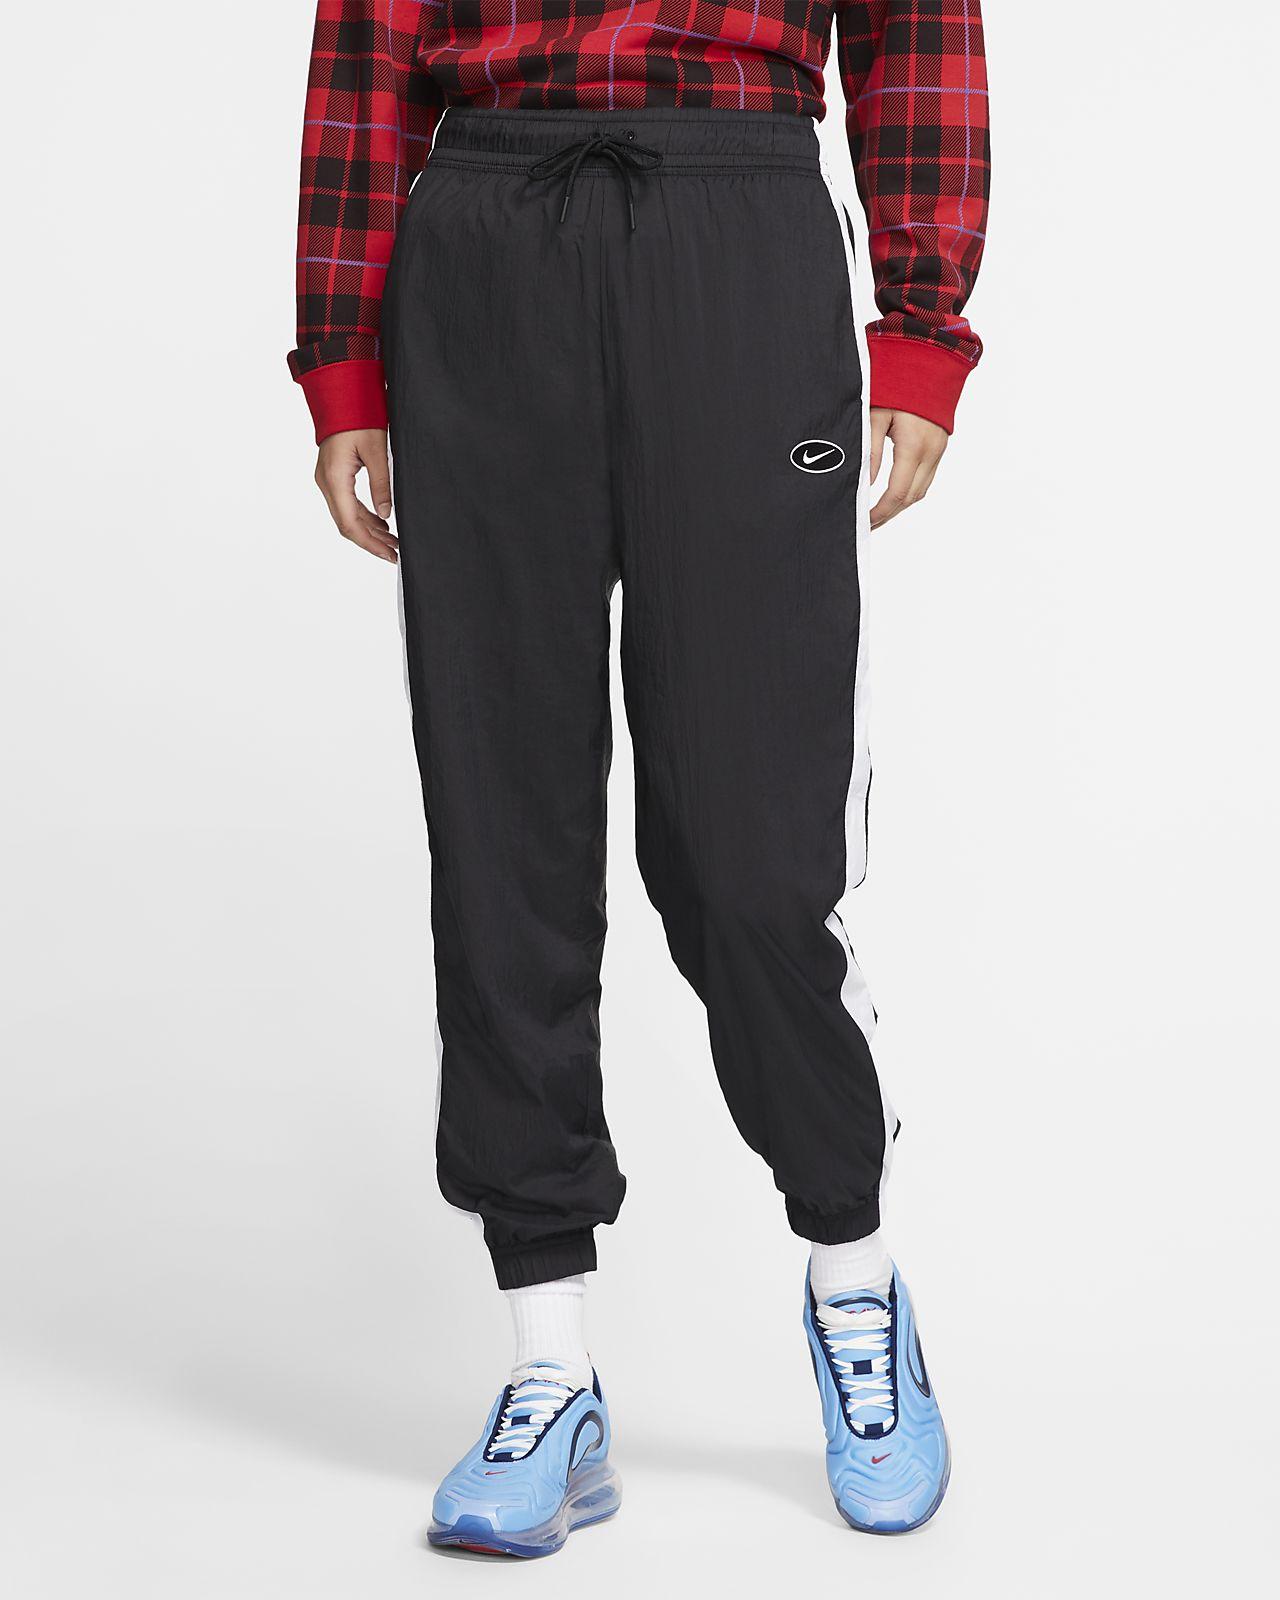 Nike Sportswear Pantalons de teixit Woven amb logotip Swoosh - Dona